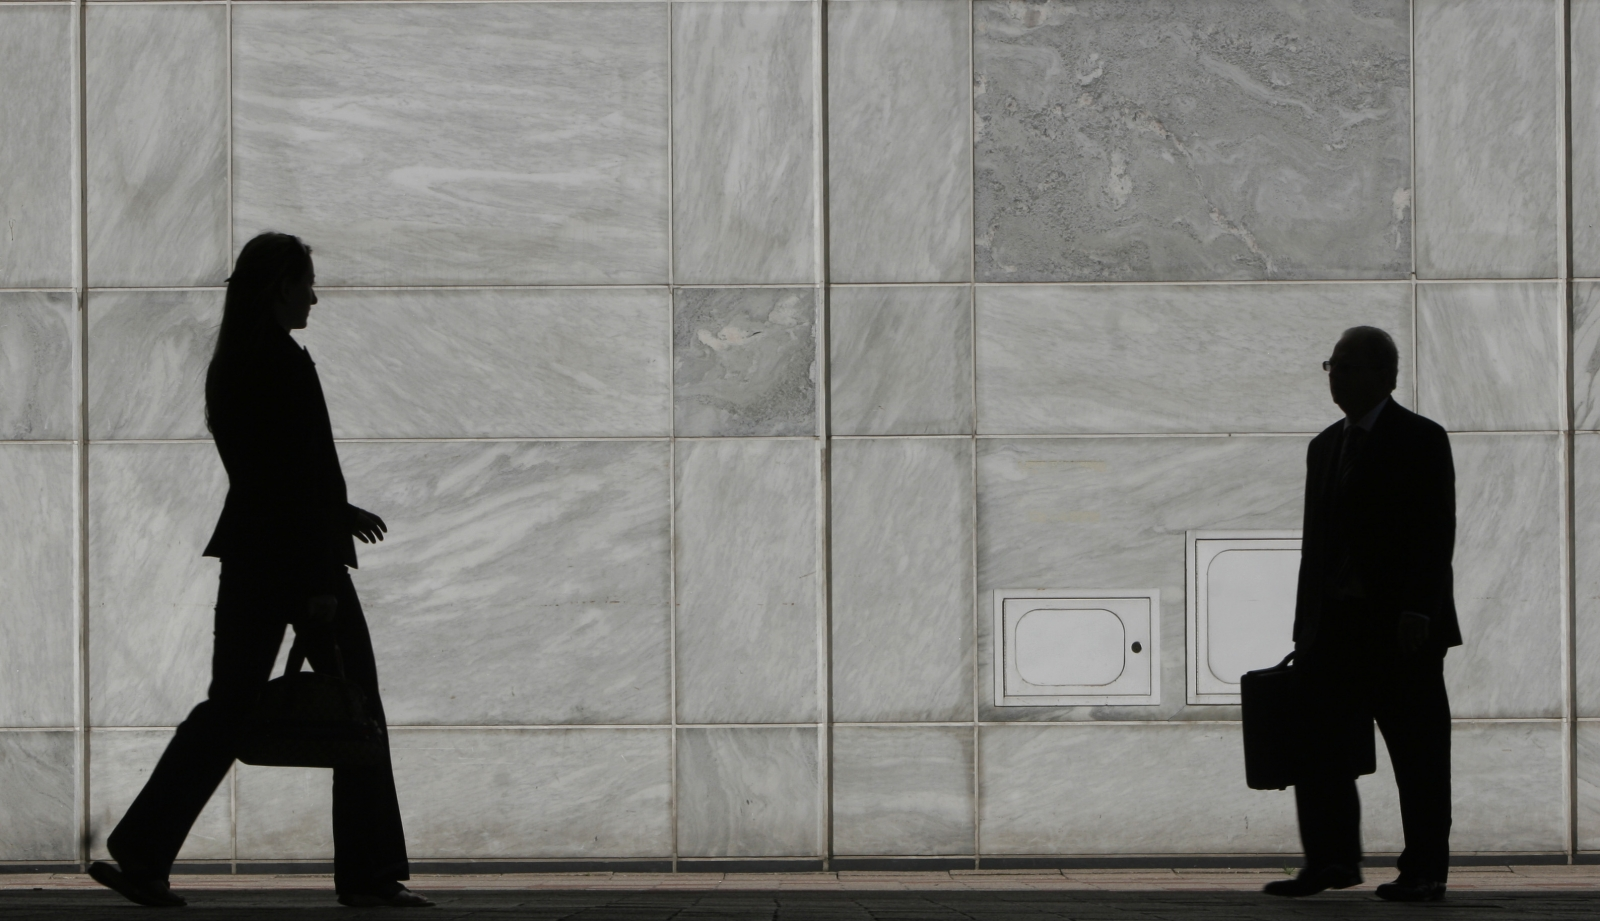 Woman walks in Canary Wharf